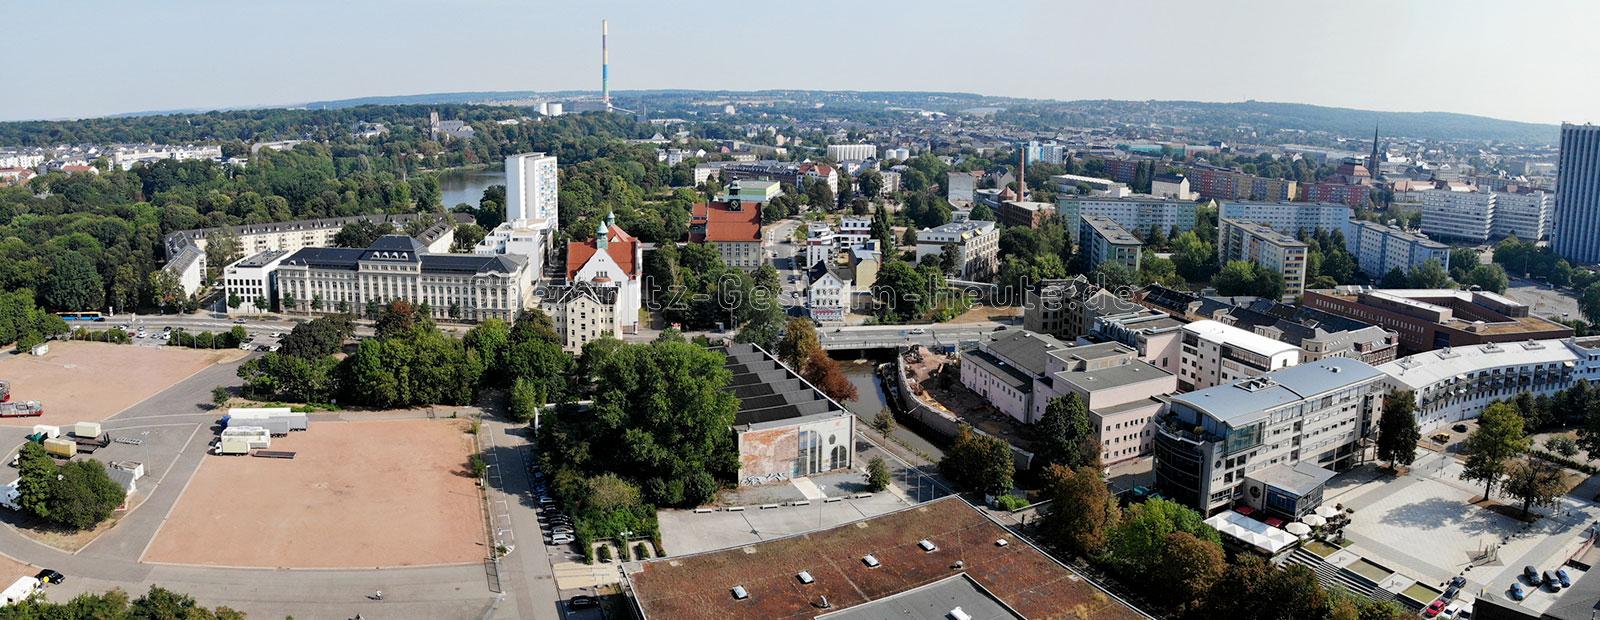 2018-08-19-Kassberg3-1600-620